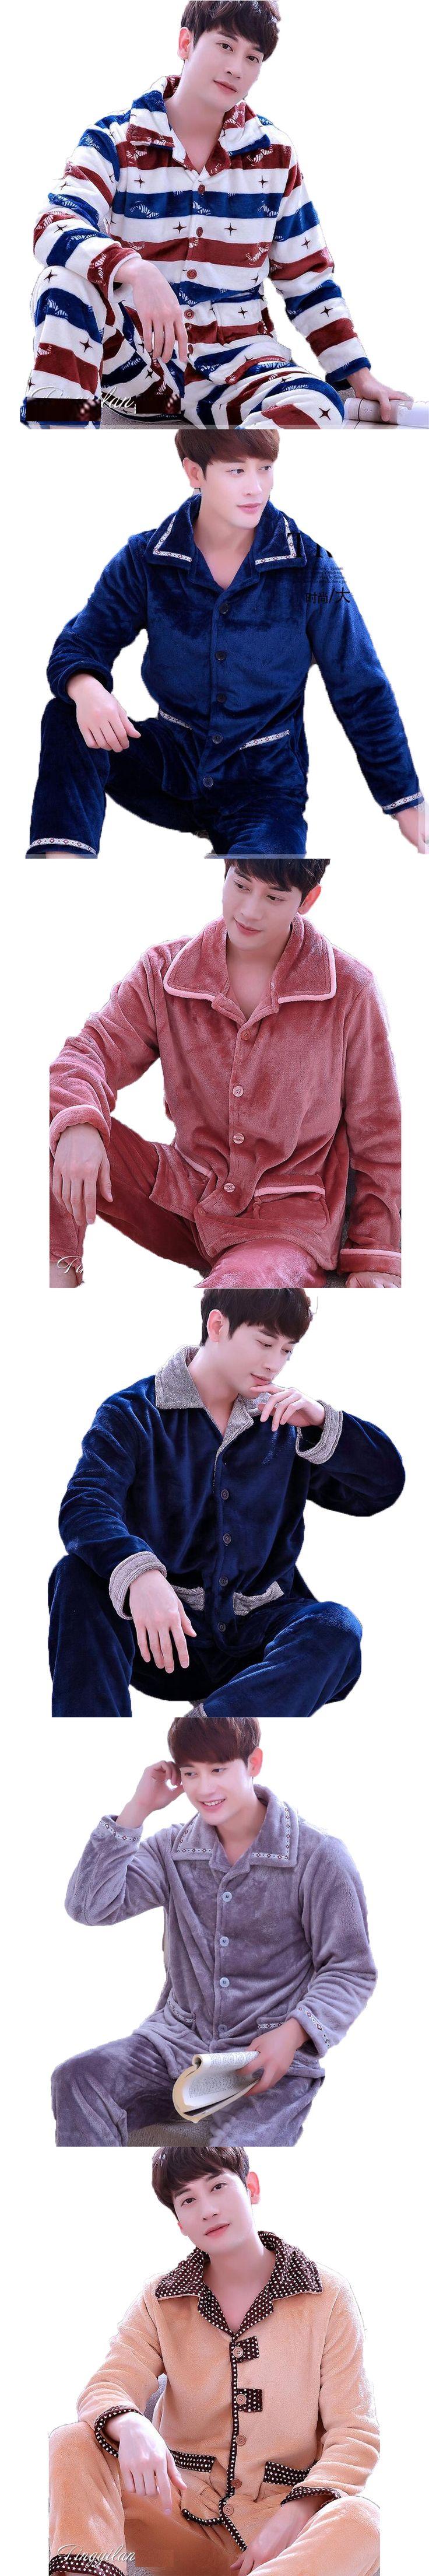 Winter Mens Flannel Pajamas Set Pijama Hombre Long Sleeve Cardigans Warm Coral Velvet Pyjamas Suits Male Sleepwear Lounge Wear